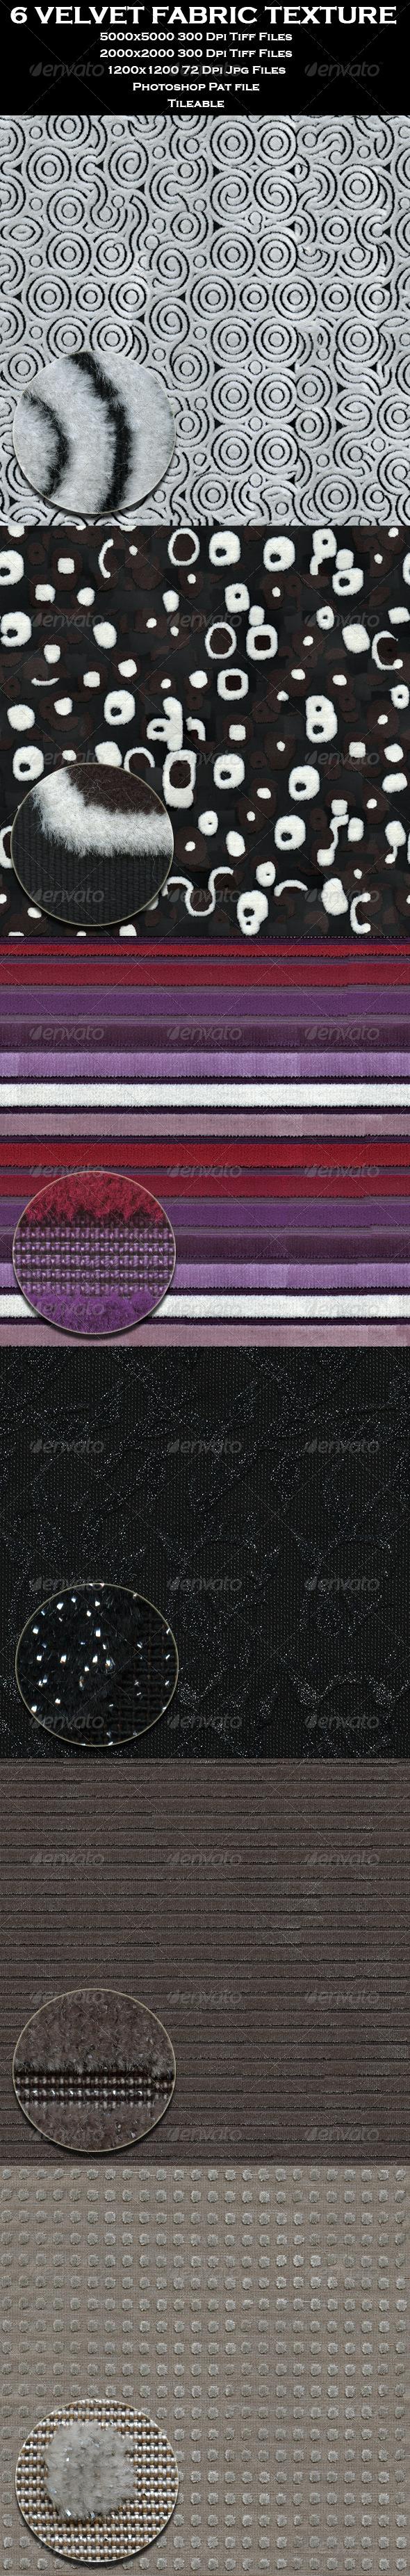 GraphicRiver 6 Velvet Fabric Texture 4653565